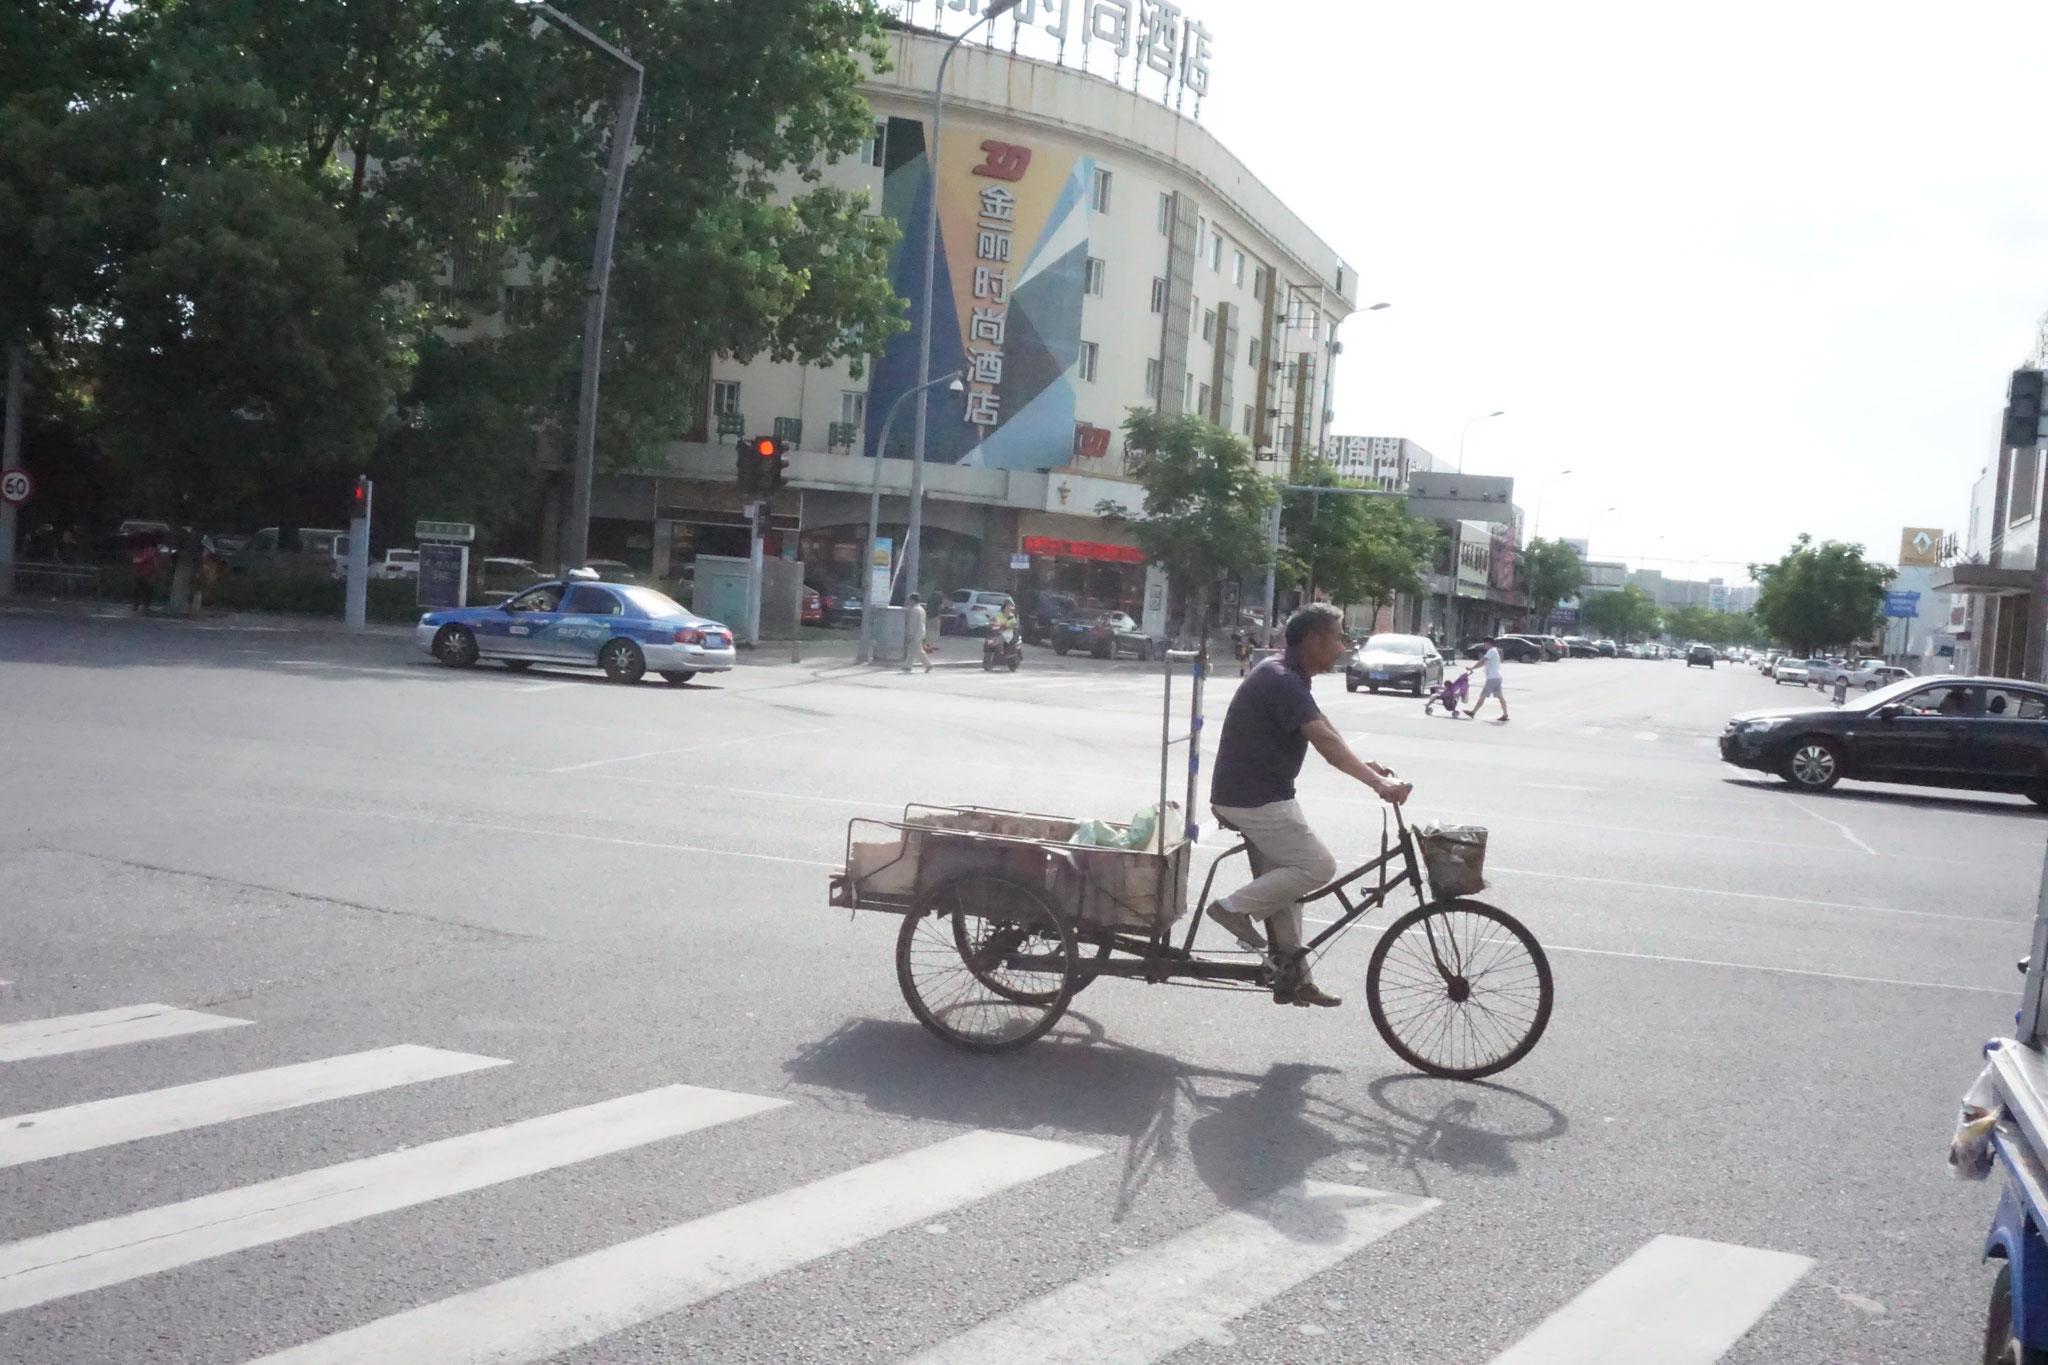 Taxi eher links im Bild